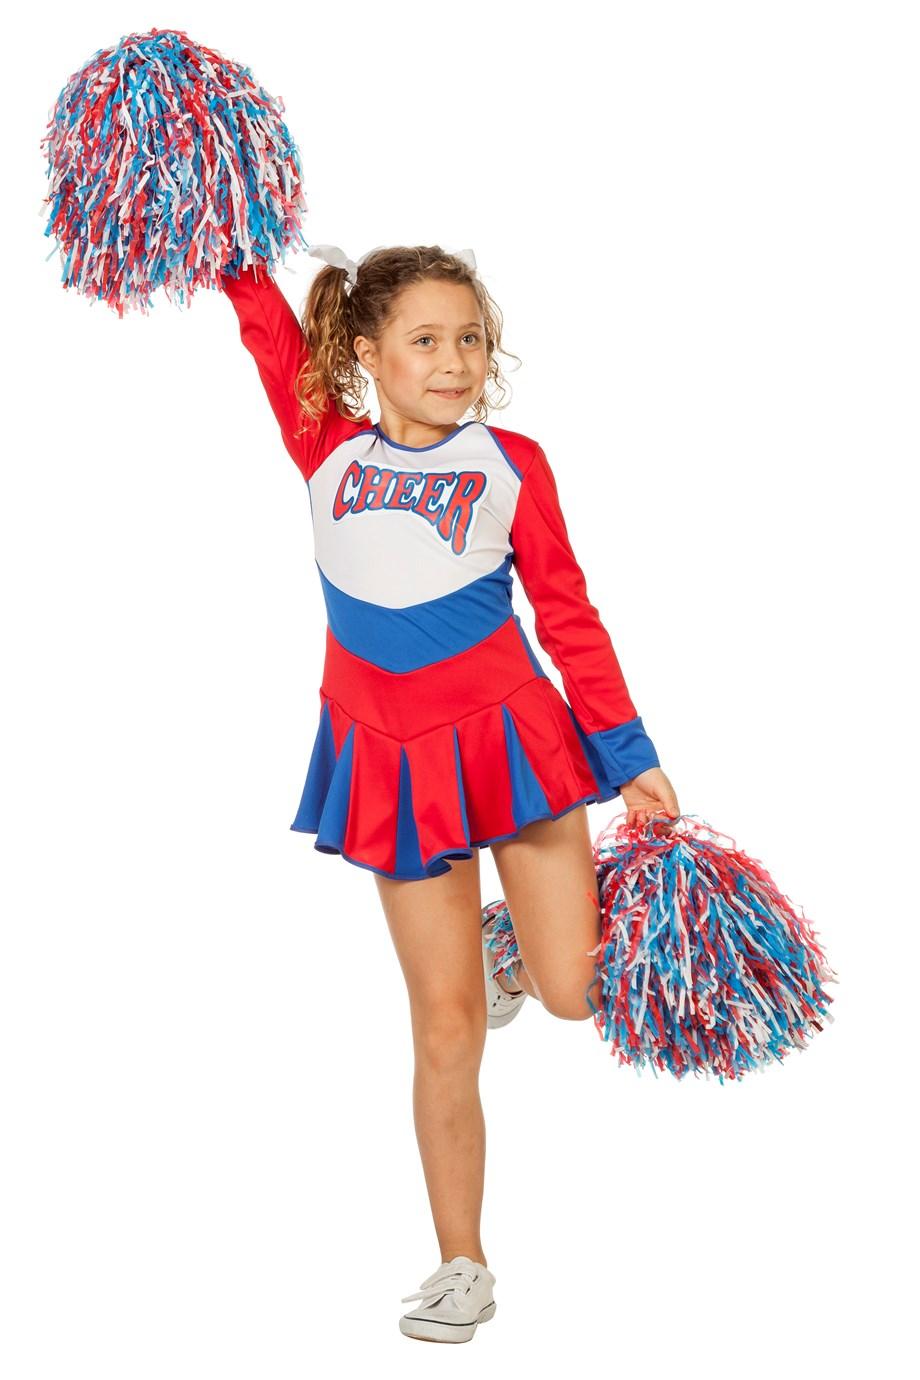 Cheerleader-0